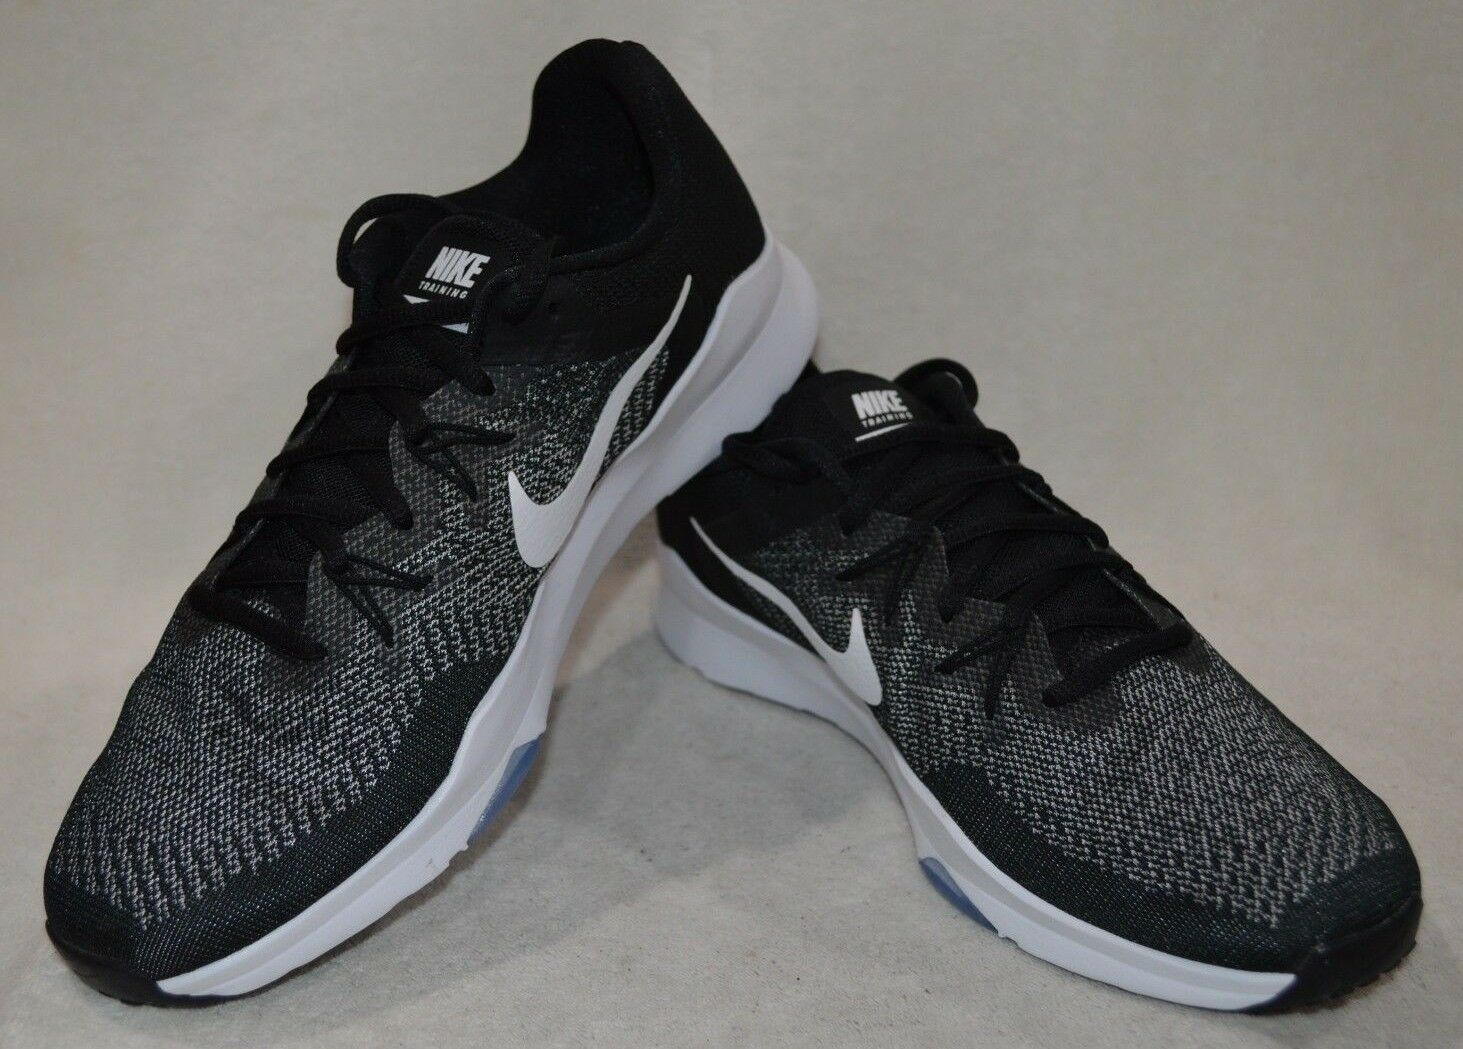 Nike Zoom Condition TR 2 Noir /Wht/G-smoke femmes Training Chaussures -Asst